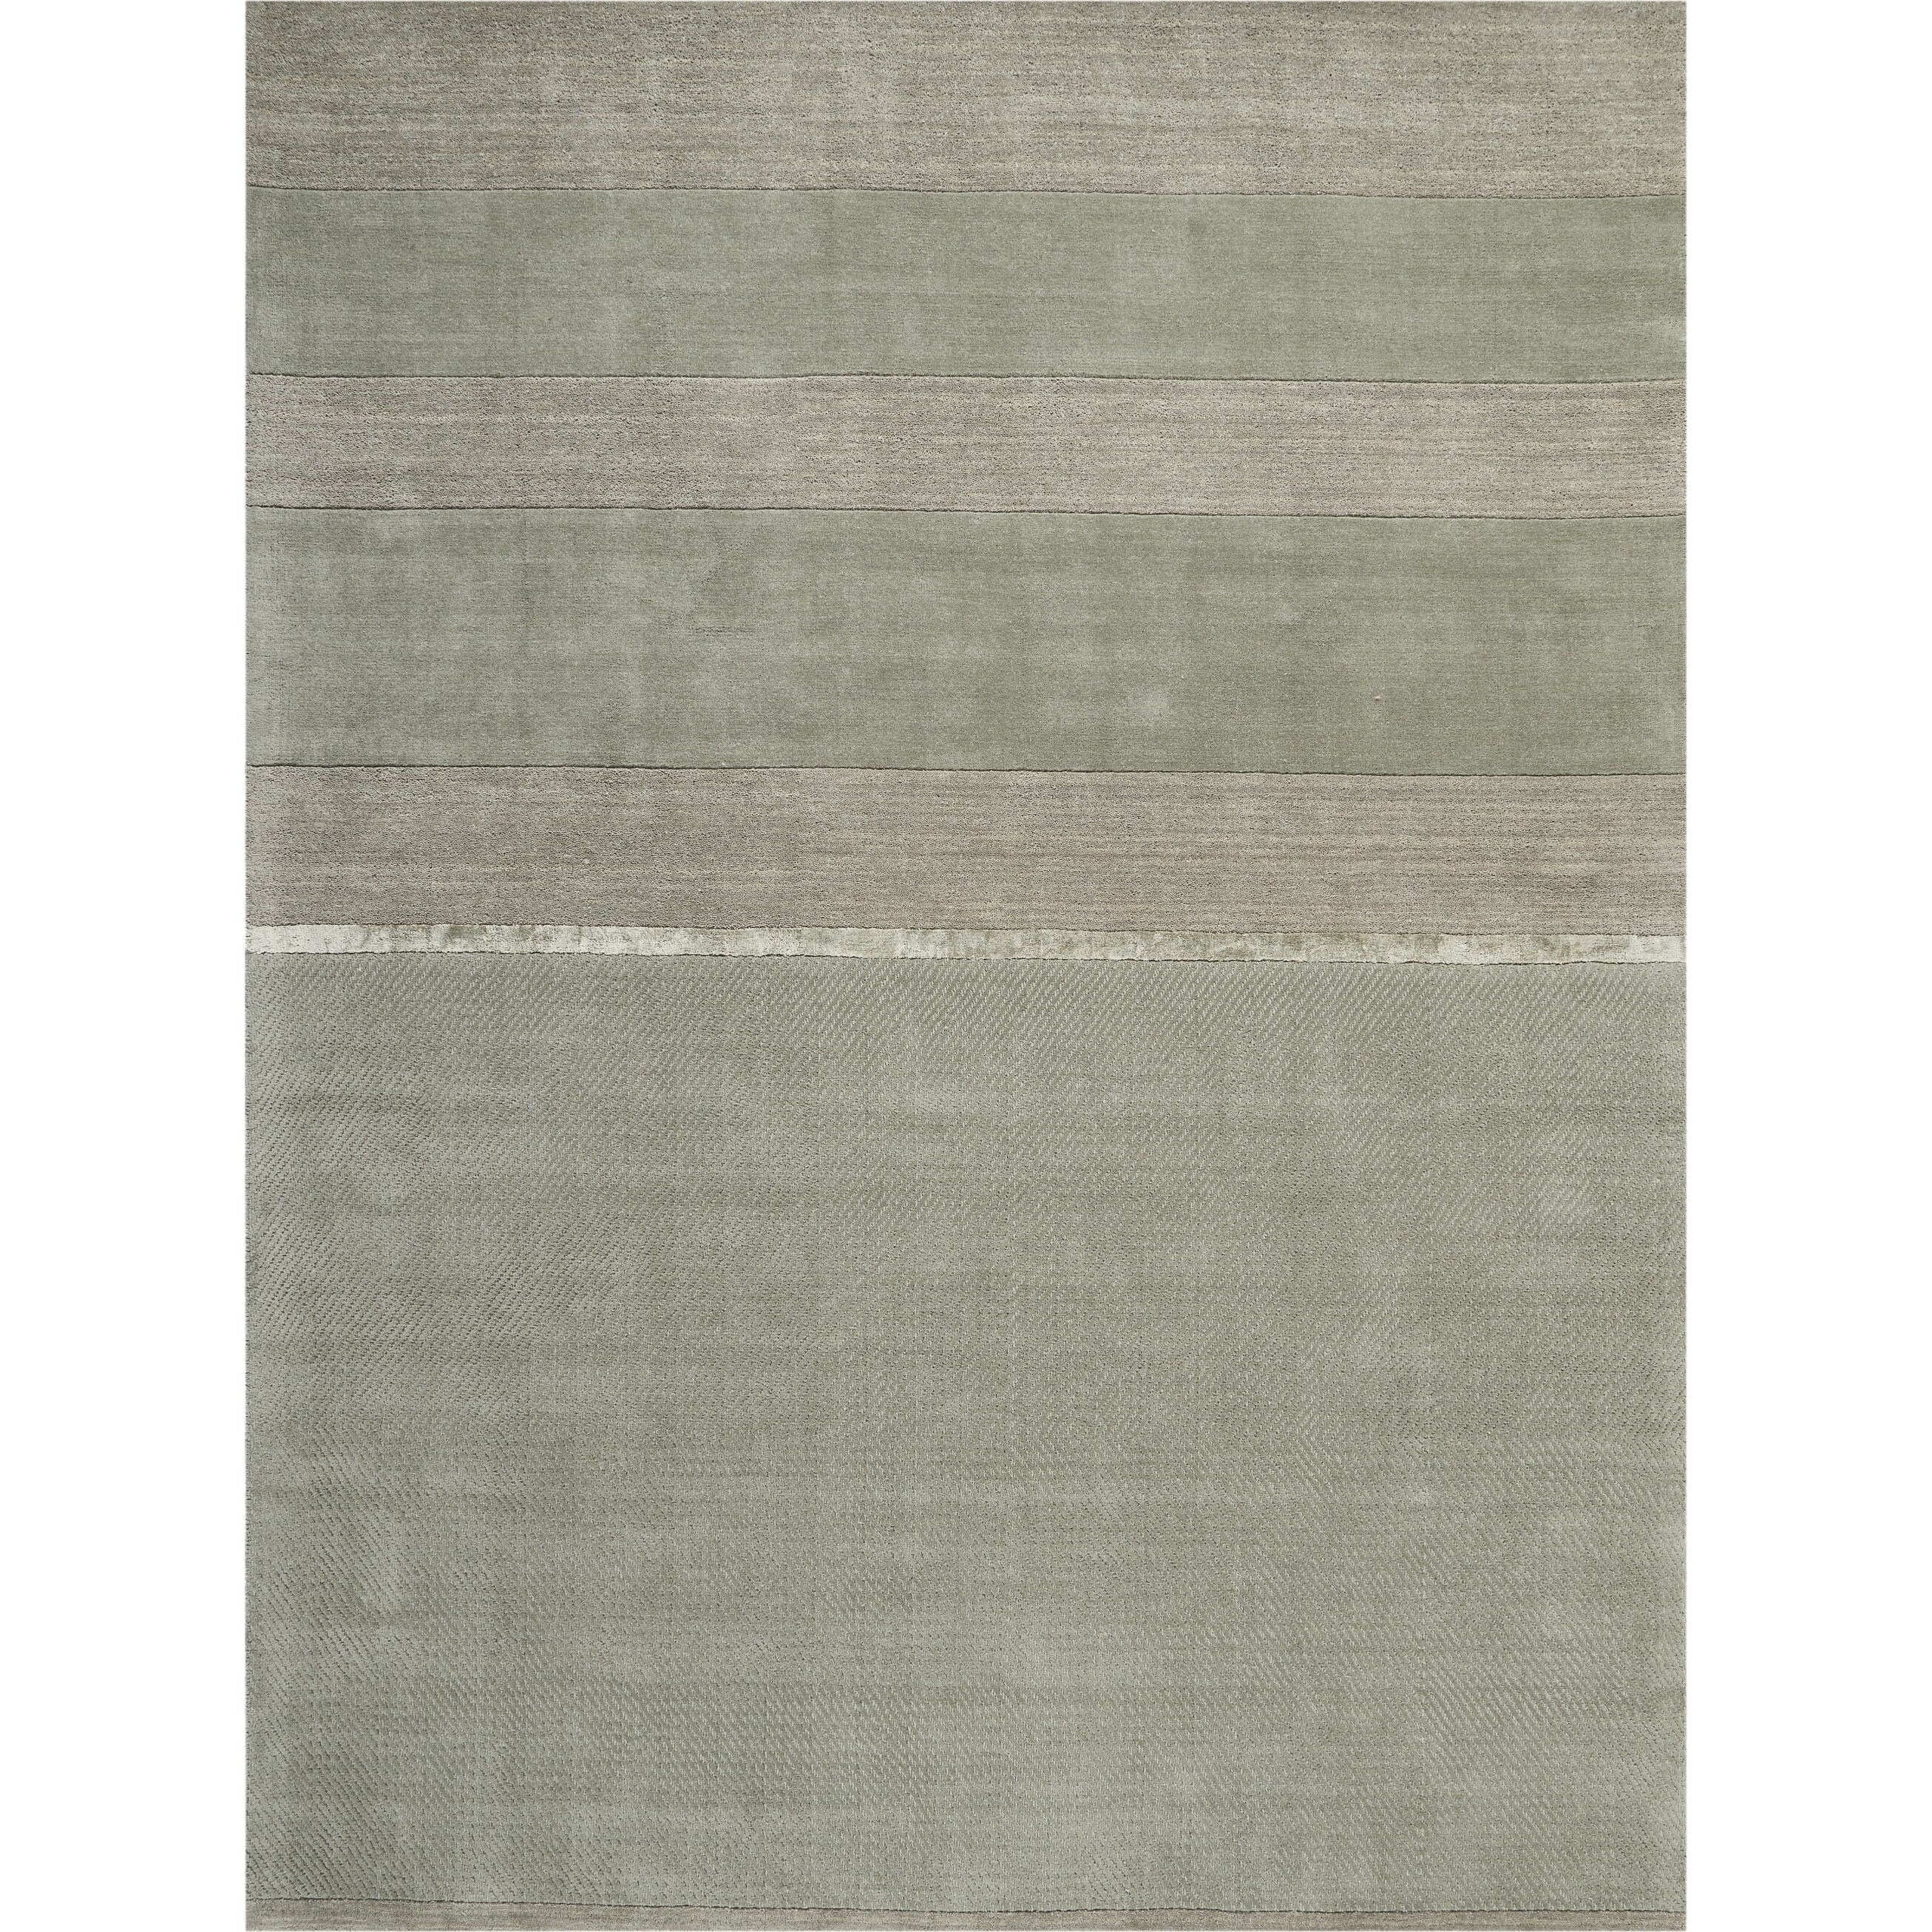 Calvin Klein Vale Handmade Grey Area Rug By Nourison 2 6 X 10